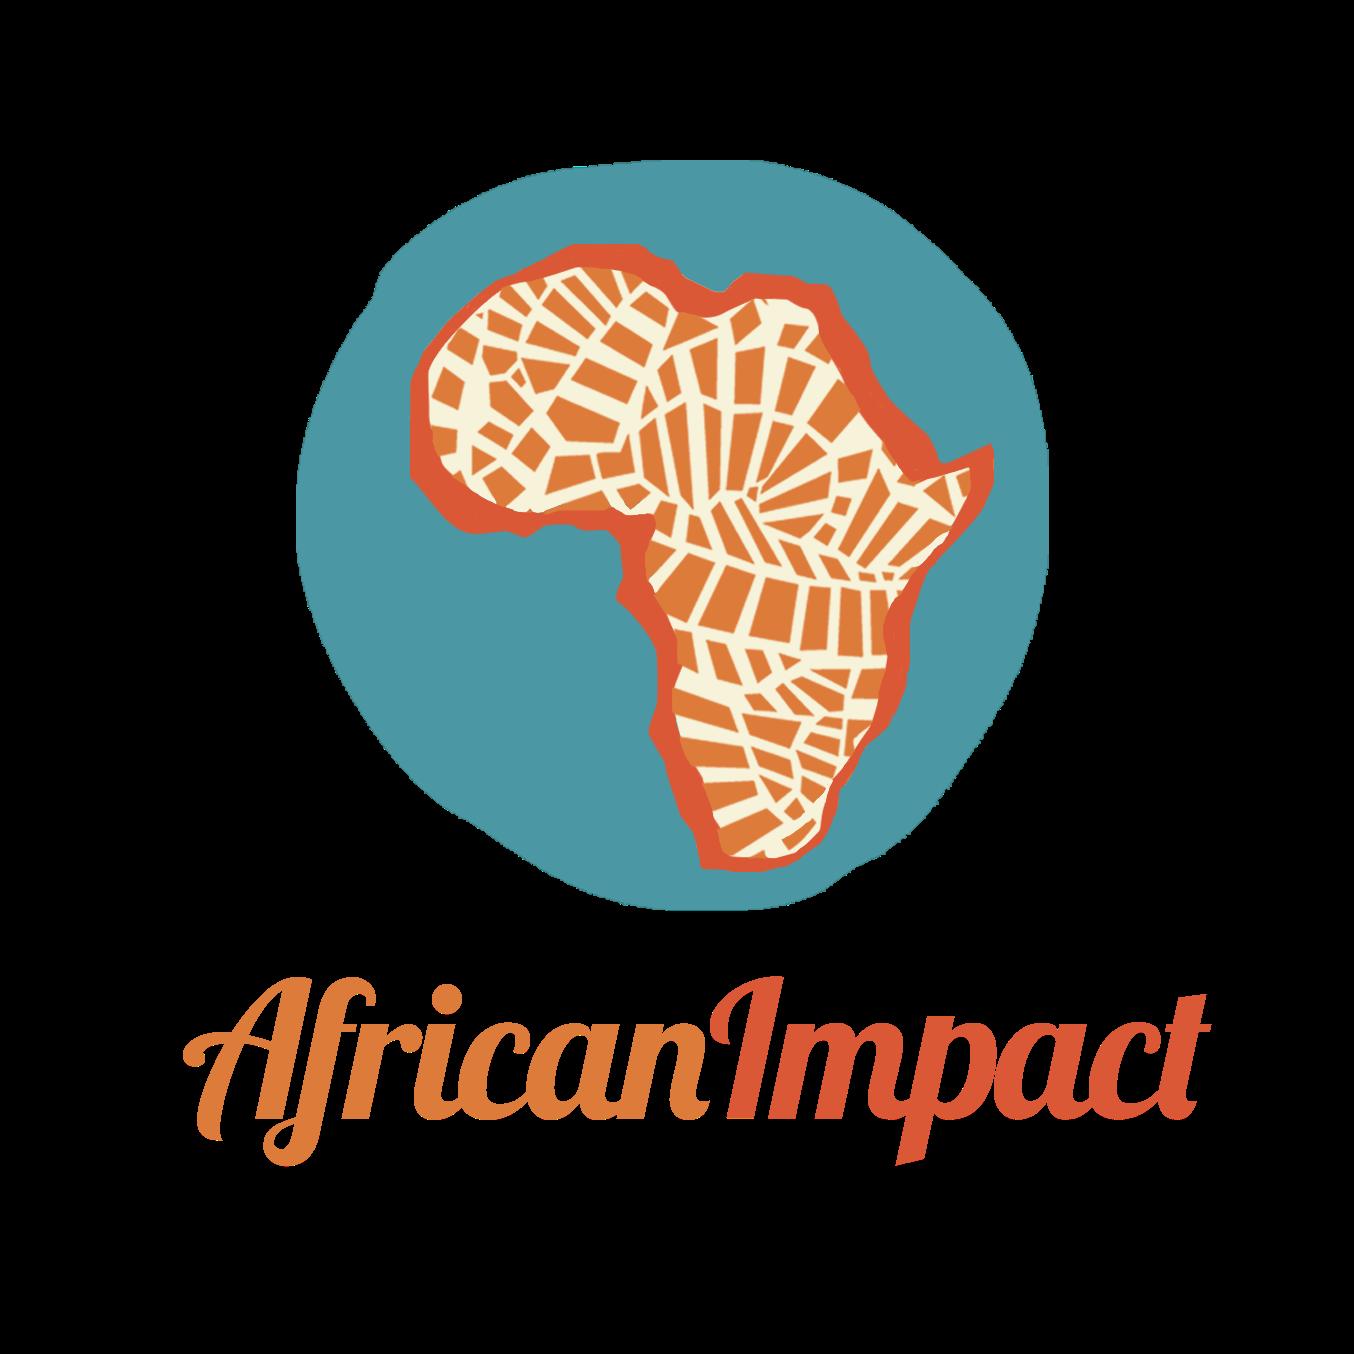 Logo of African Impact